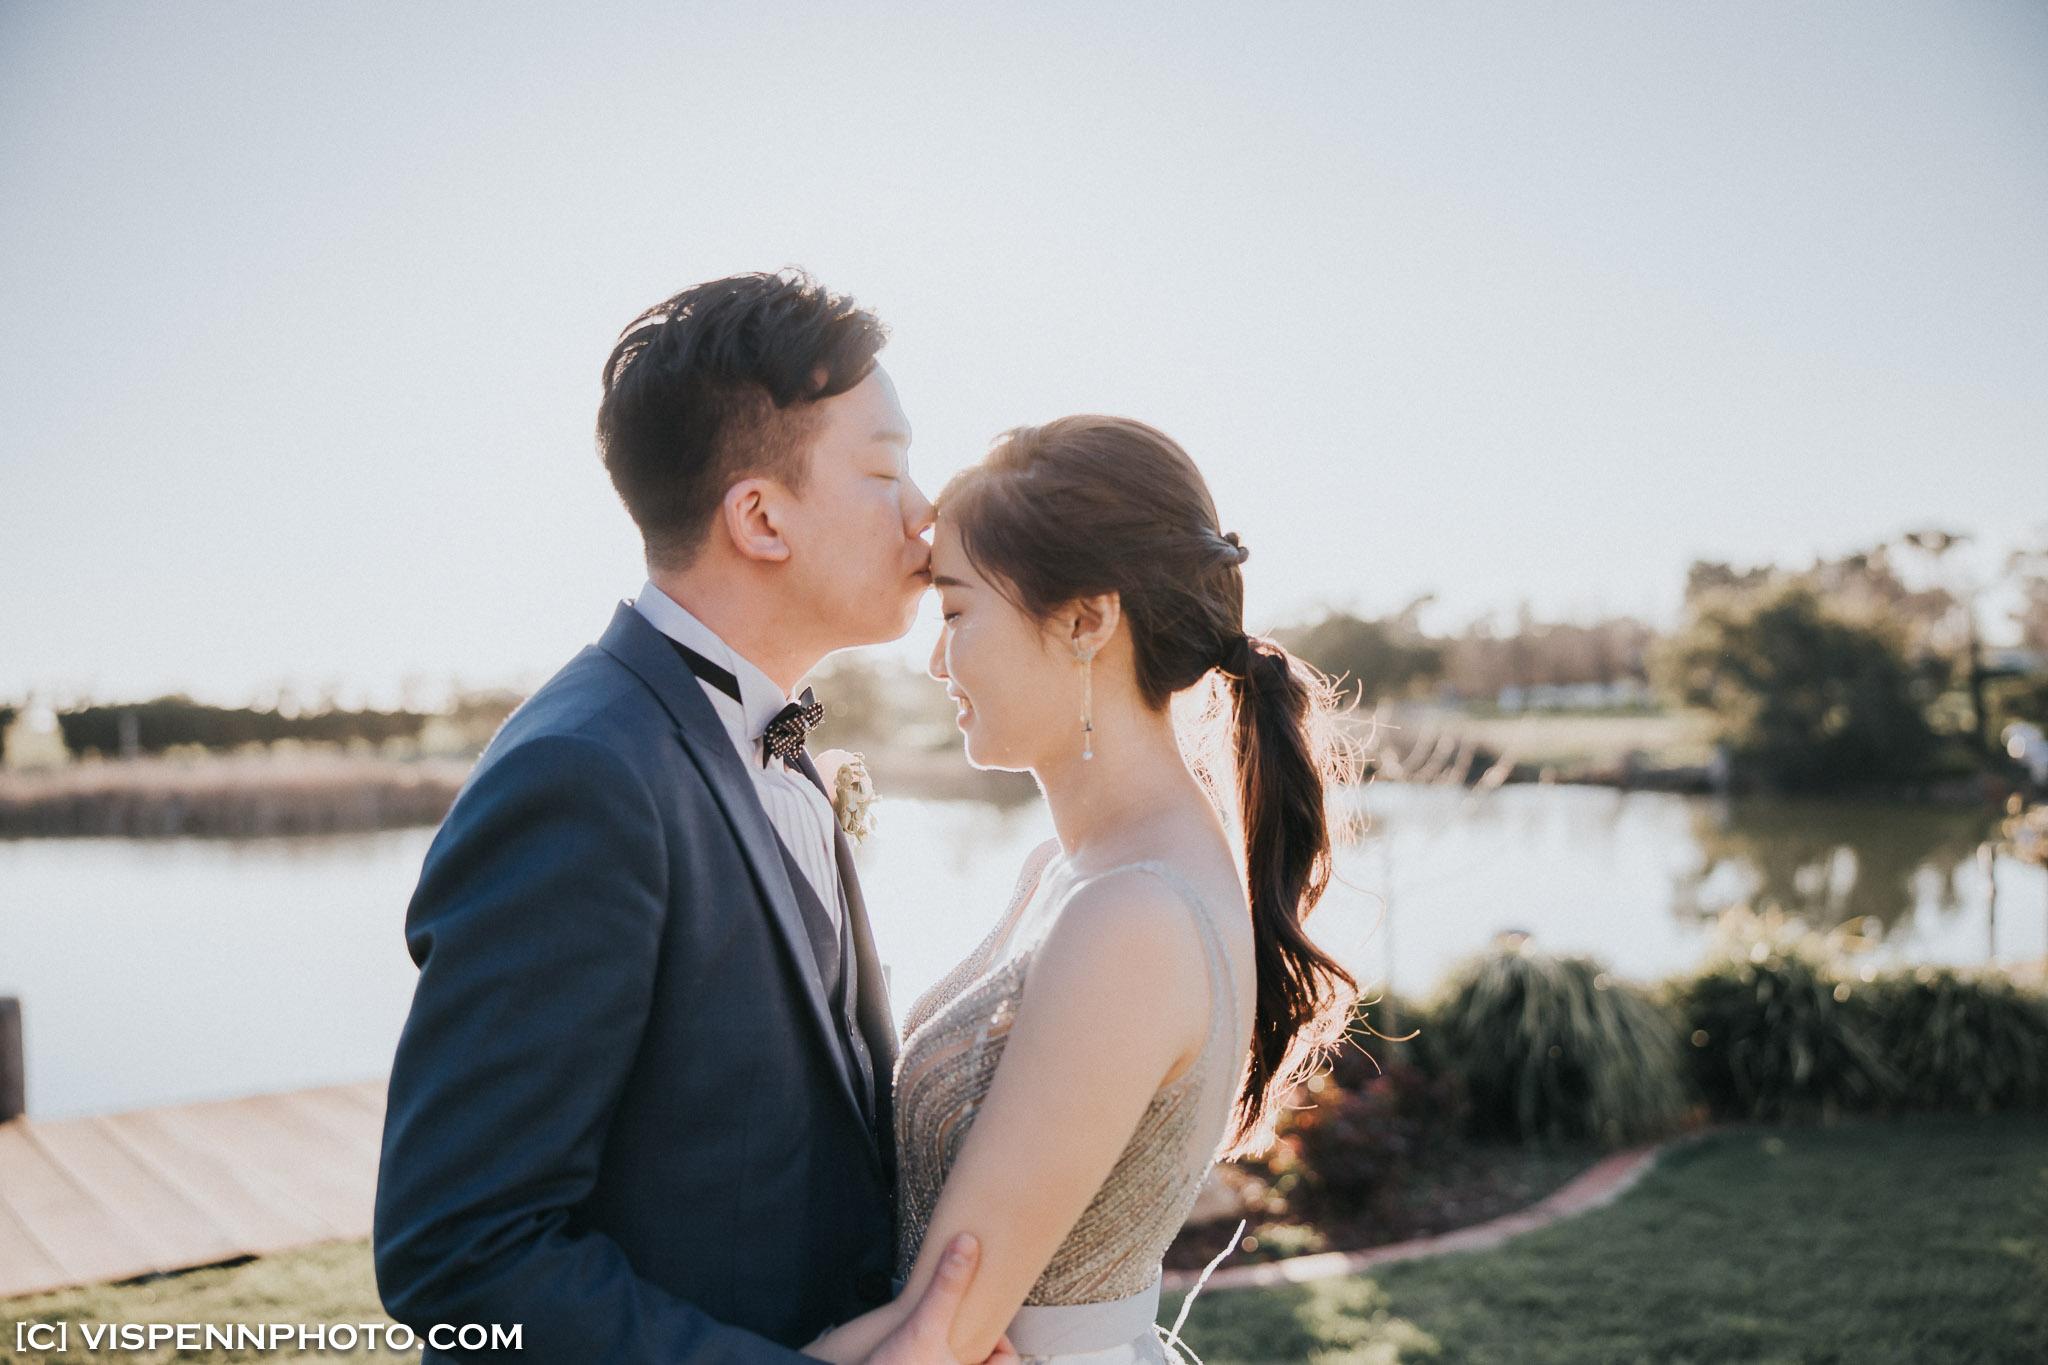 WEDDING DAY Photography Melbourne VISPENN 墨尔本 婚礼跟拍 婚礼摄像 婚礼摄影 结婚照 登记照 AndyIcyWED 9924 EOSR VISPENN